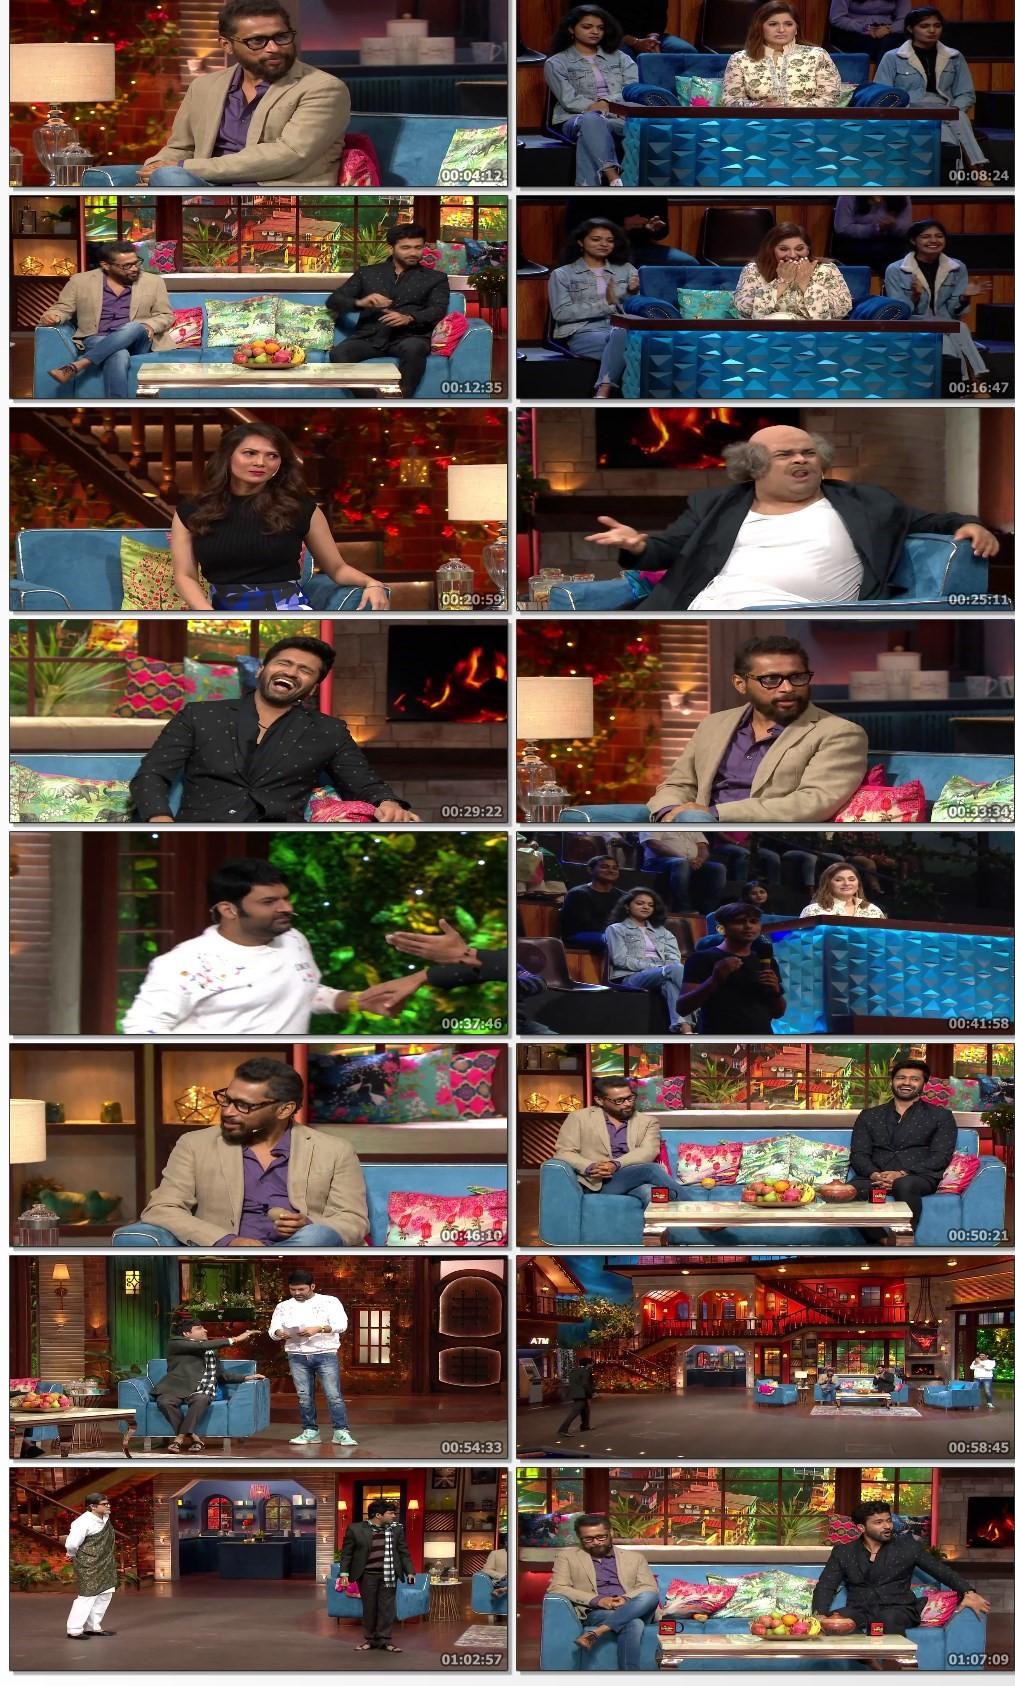 The-Kapil-Sharma-Show-10-October-2021-www-9kmovies-work-Hindi-720p-HDRip-500-MB-mkv-thumbsc66a8d303c